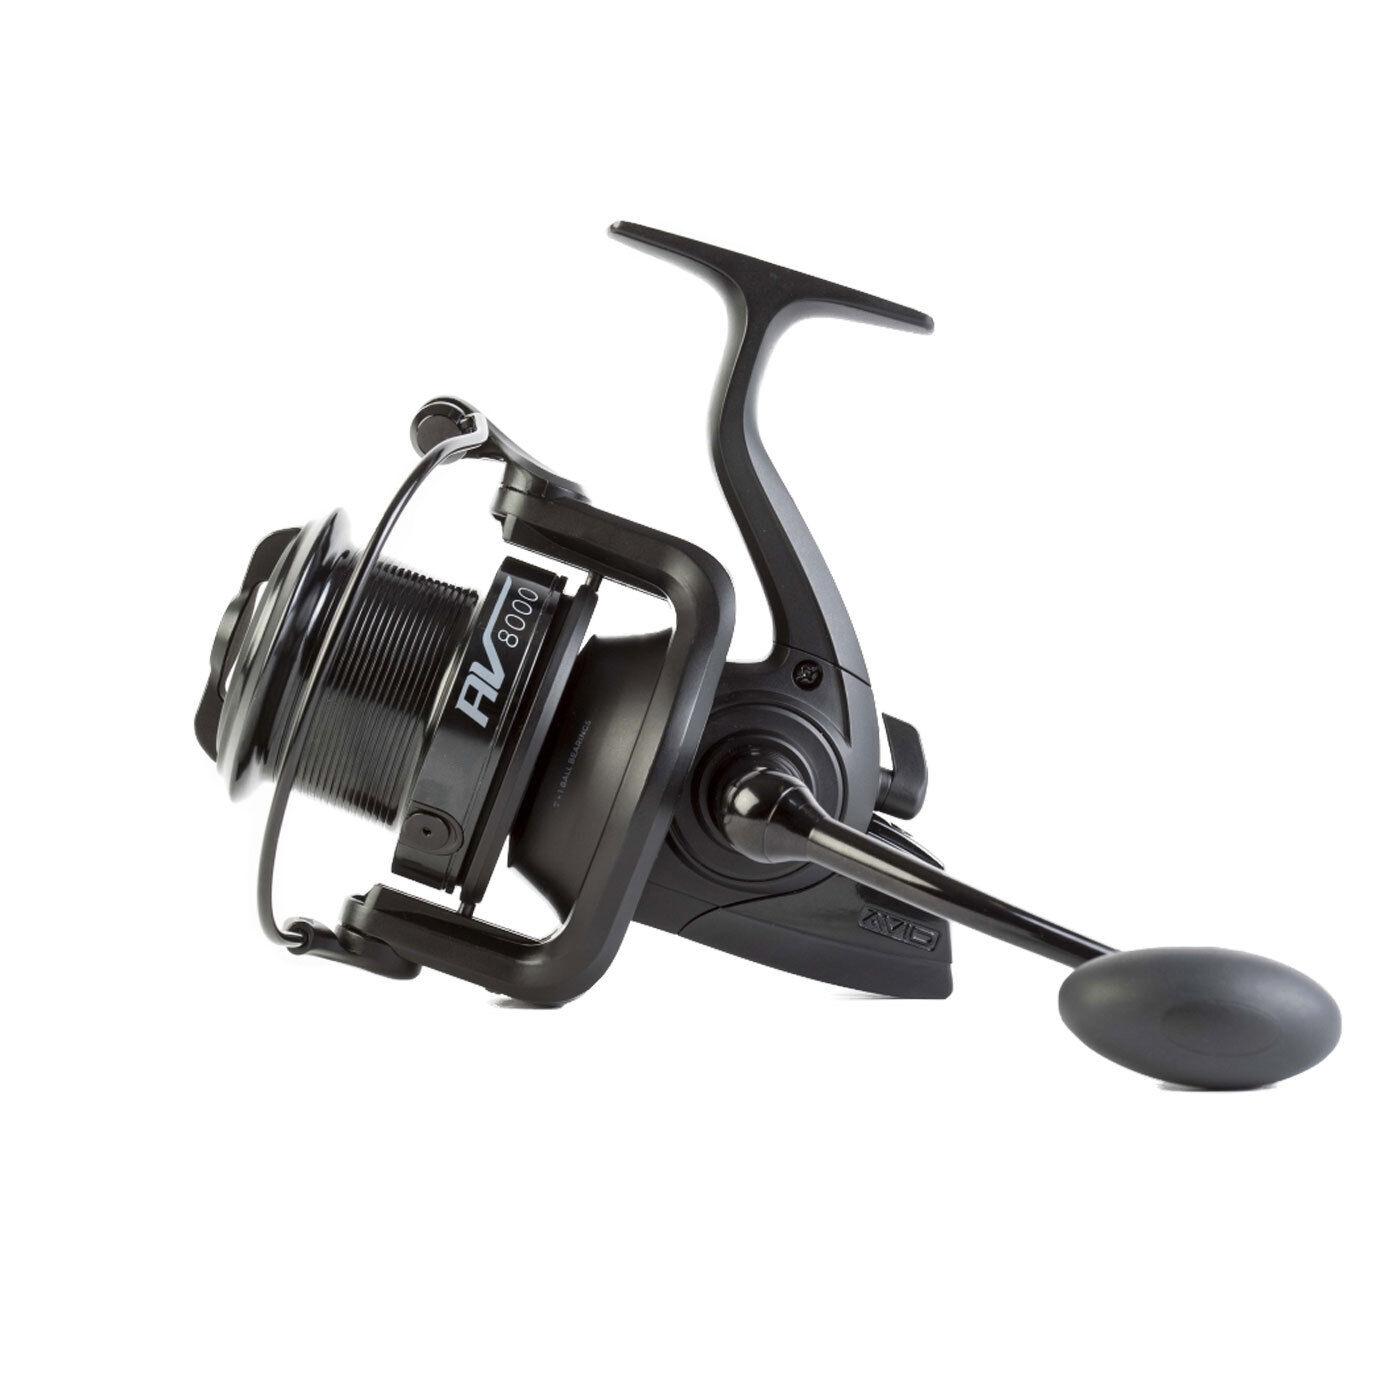 Avid Carp AV8000 Carrete de Pesca de Carpa  Totalmente nuevo para 2018 19